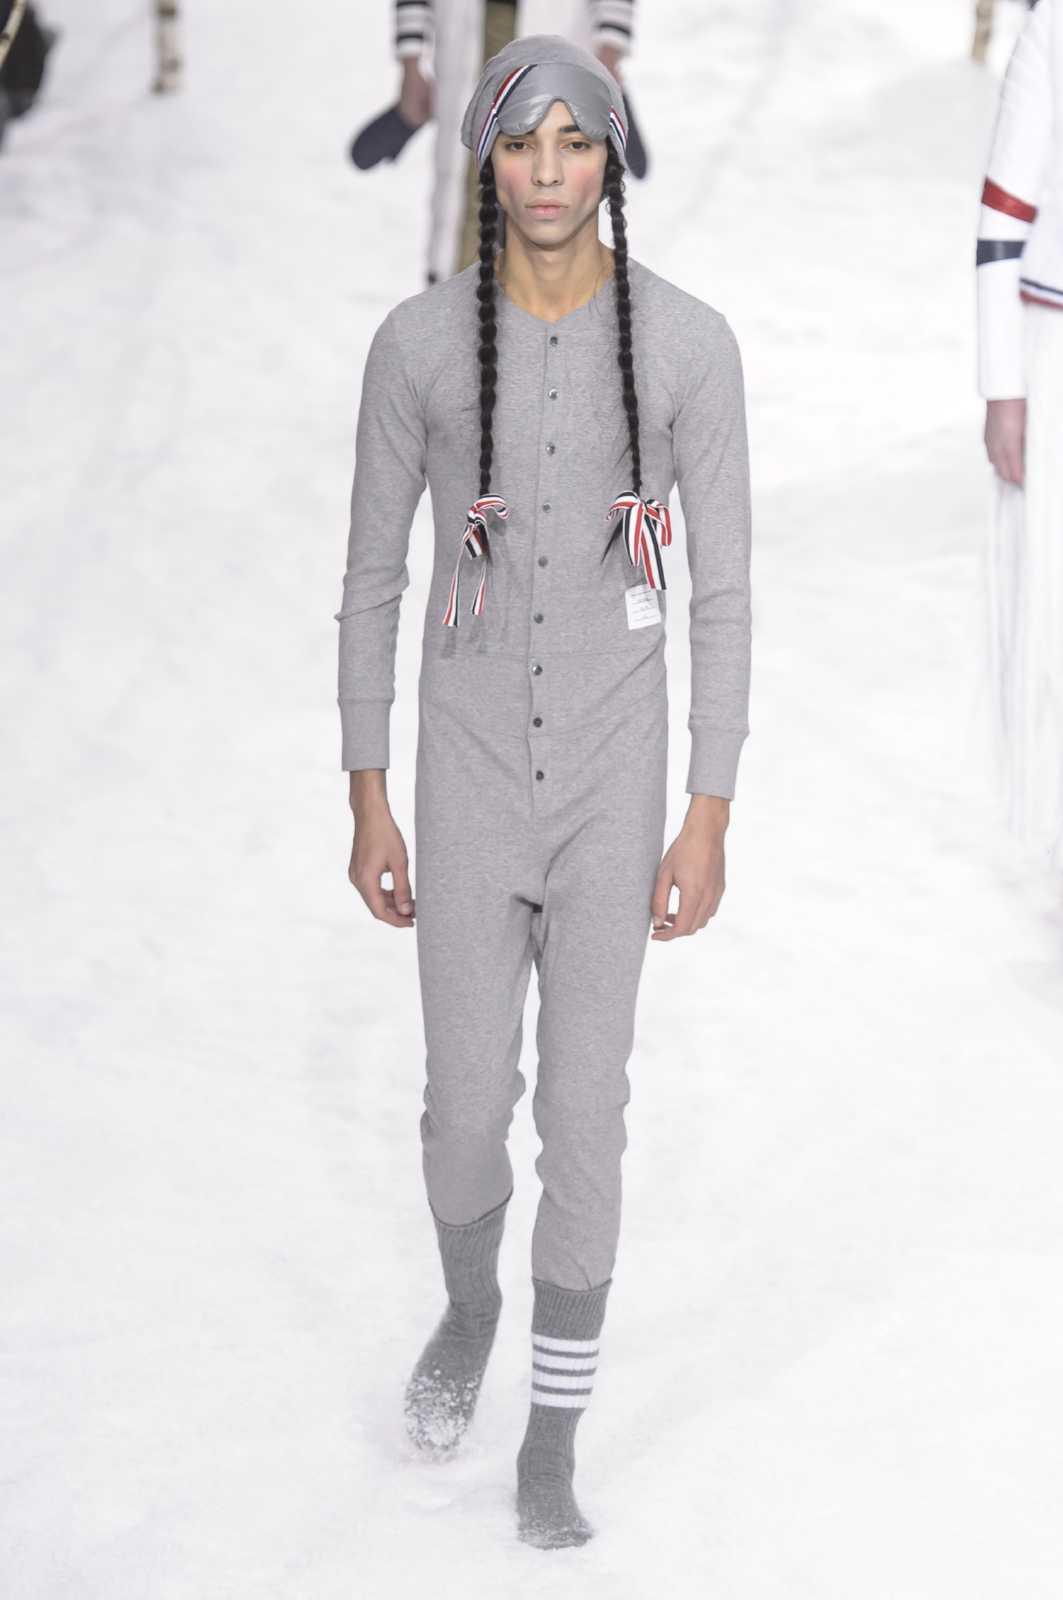 Vogue Winter Fashion Ecosia